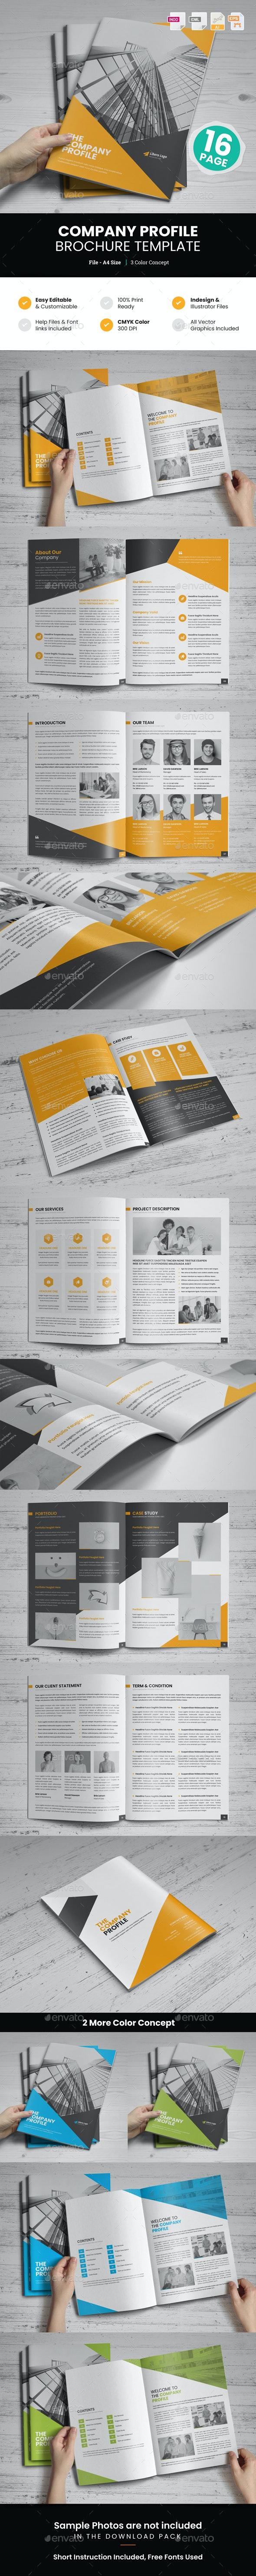 Company Profile Brochure Design v8 - Corporate Brochures